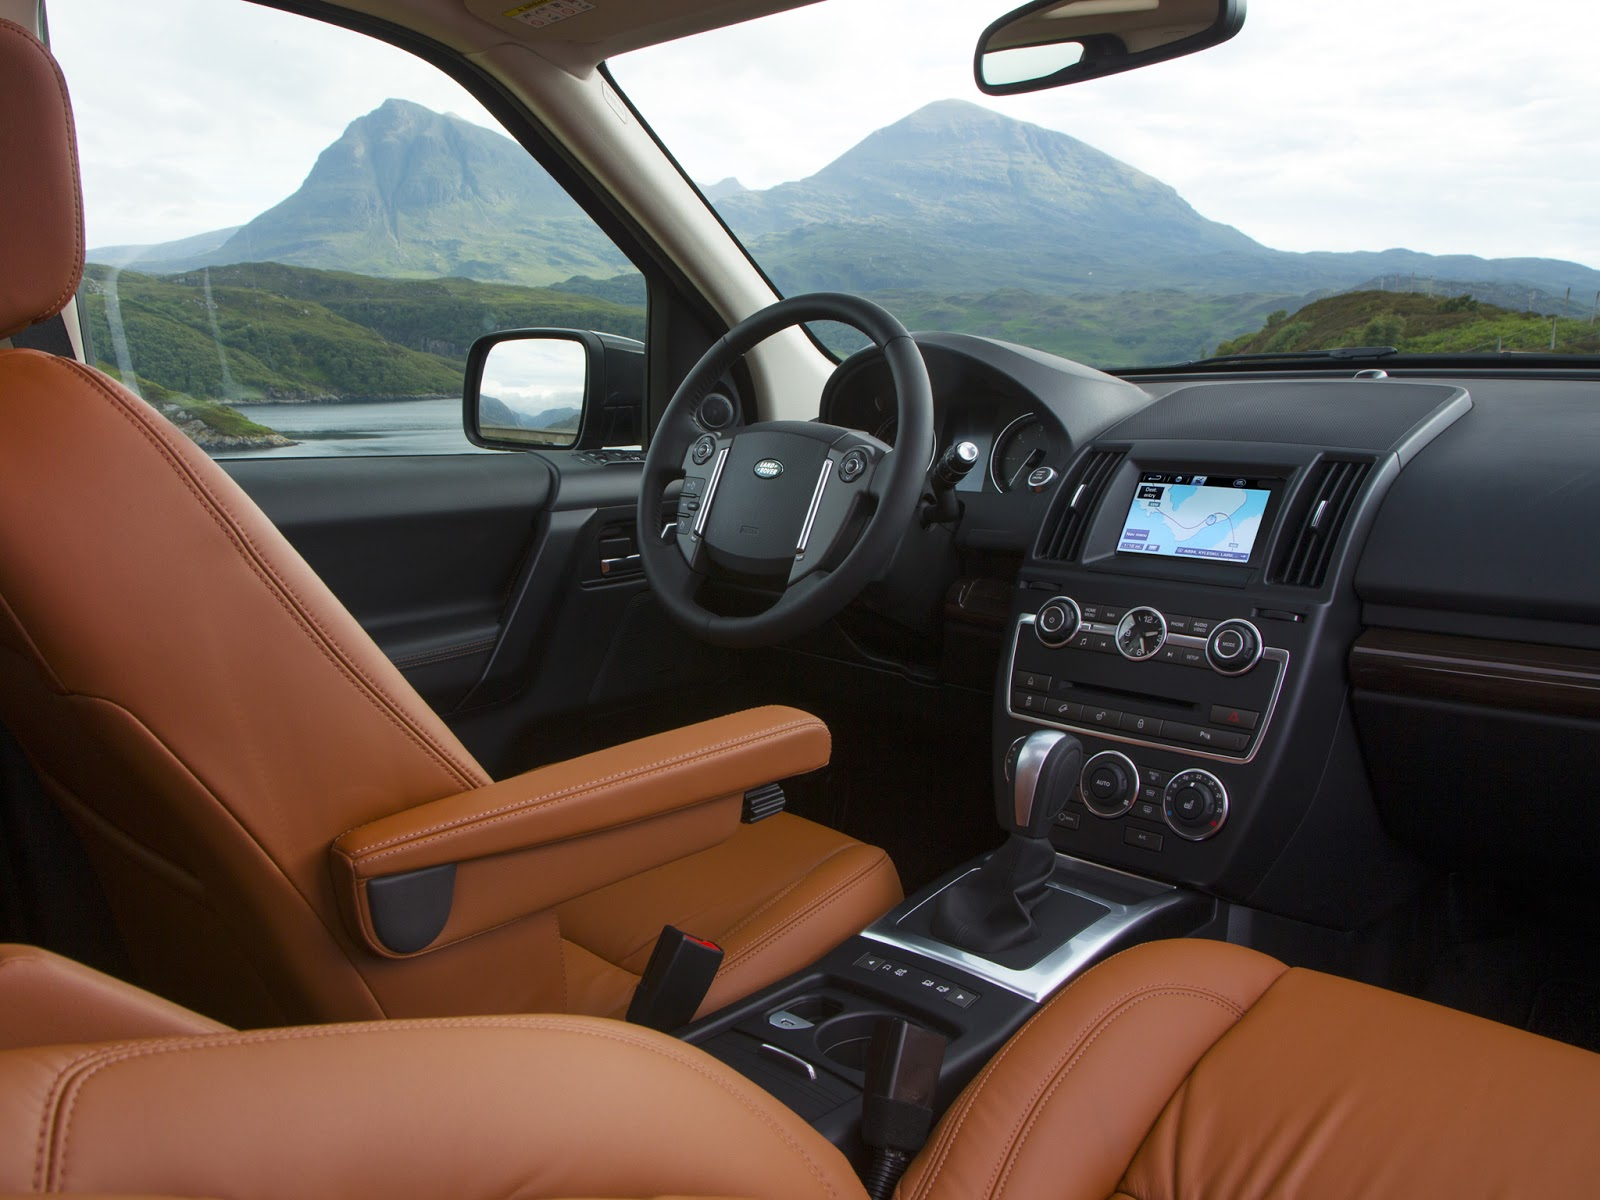 car on Land Rover Freelander 2 2013